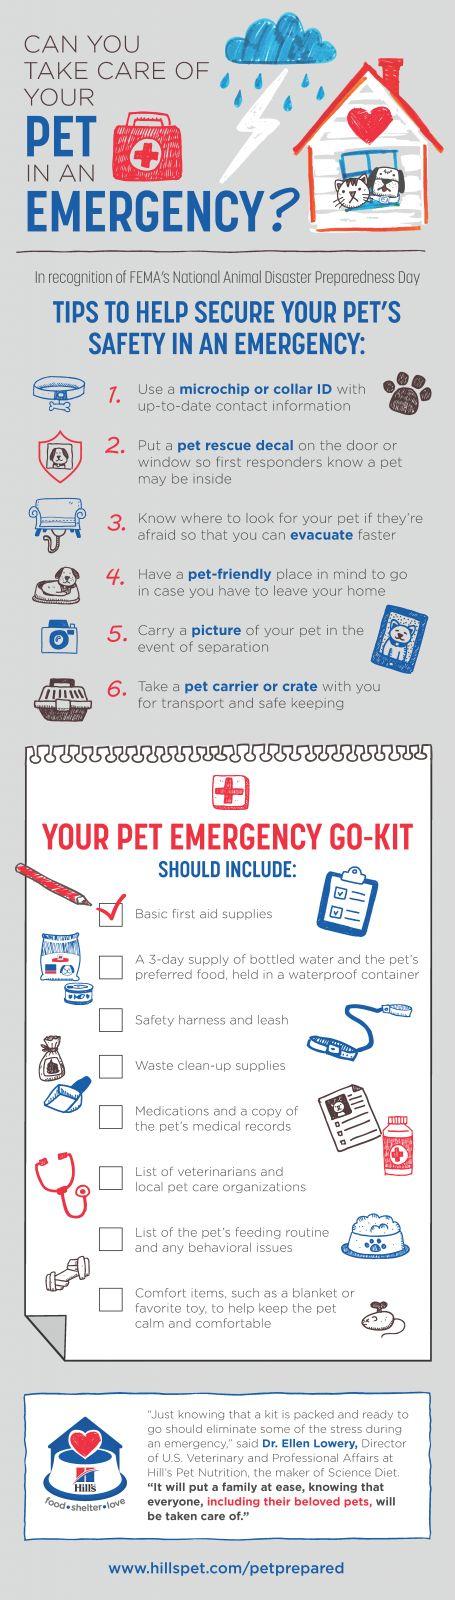 Best 25+ Emergency disaster preparation ideas on Pinterest - emergency response plan template